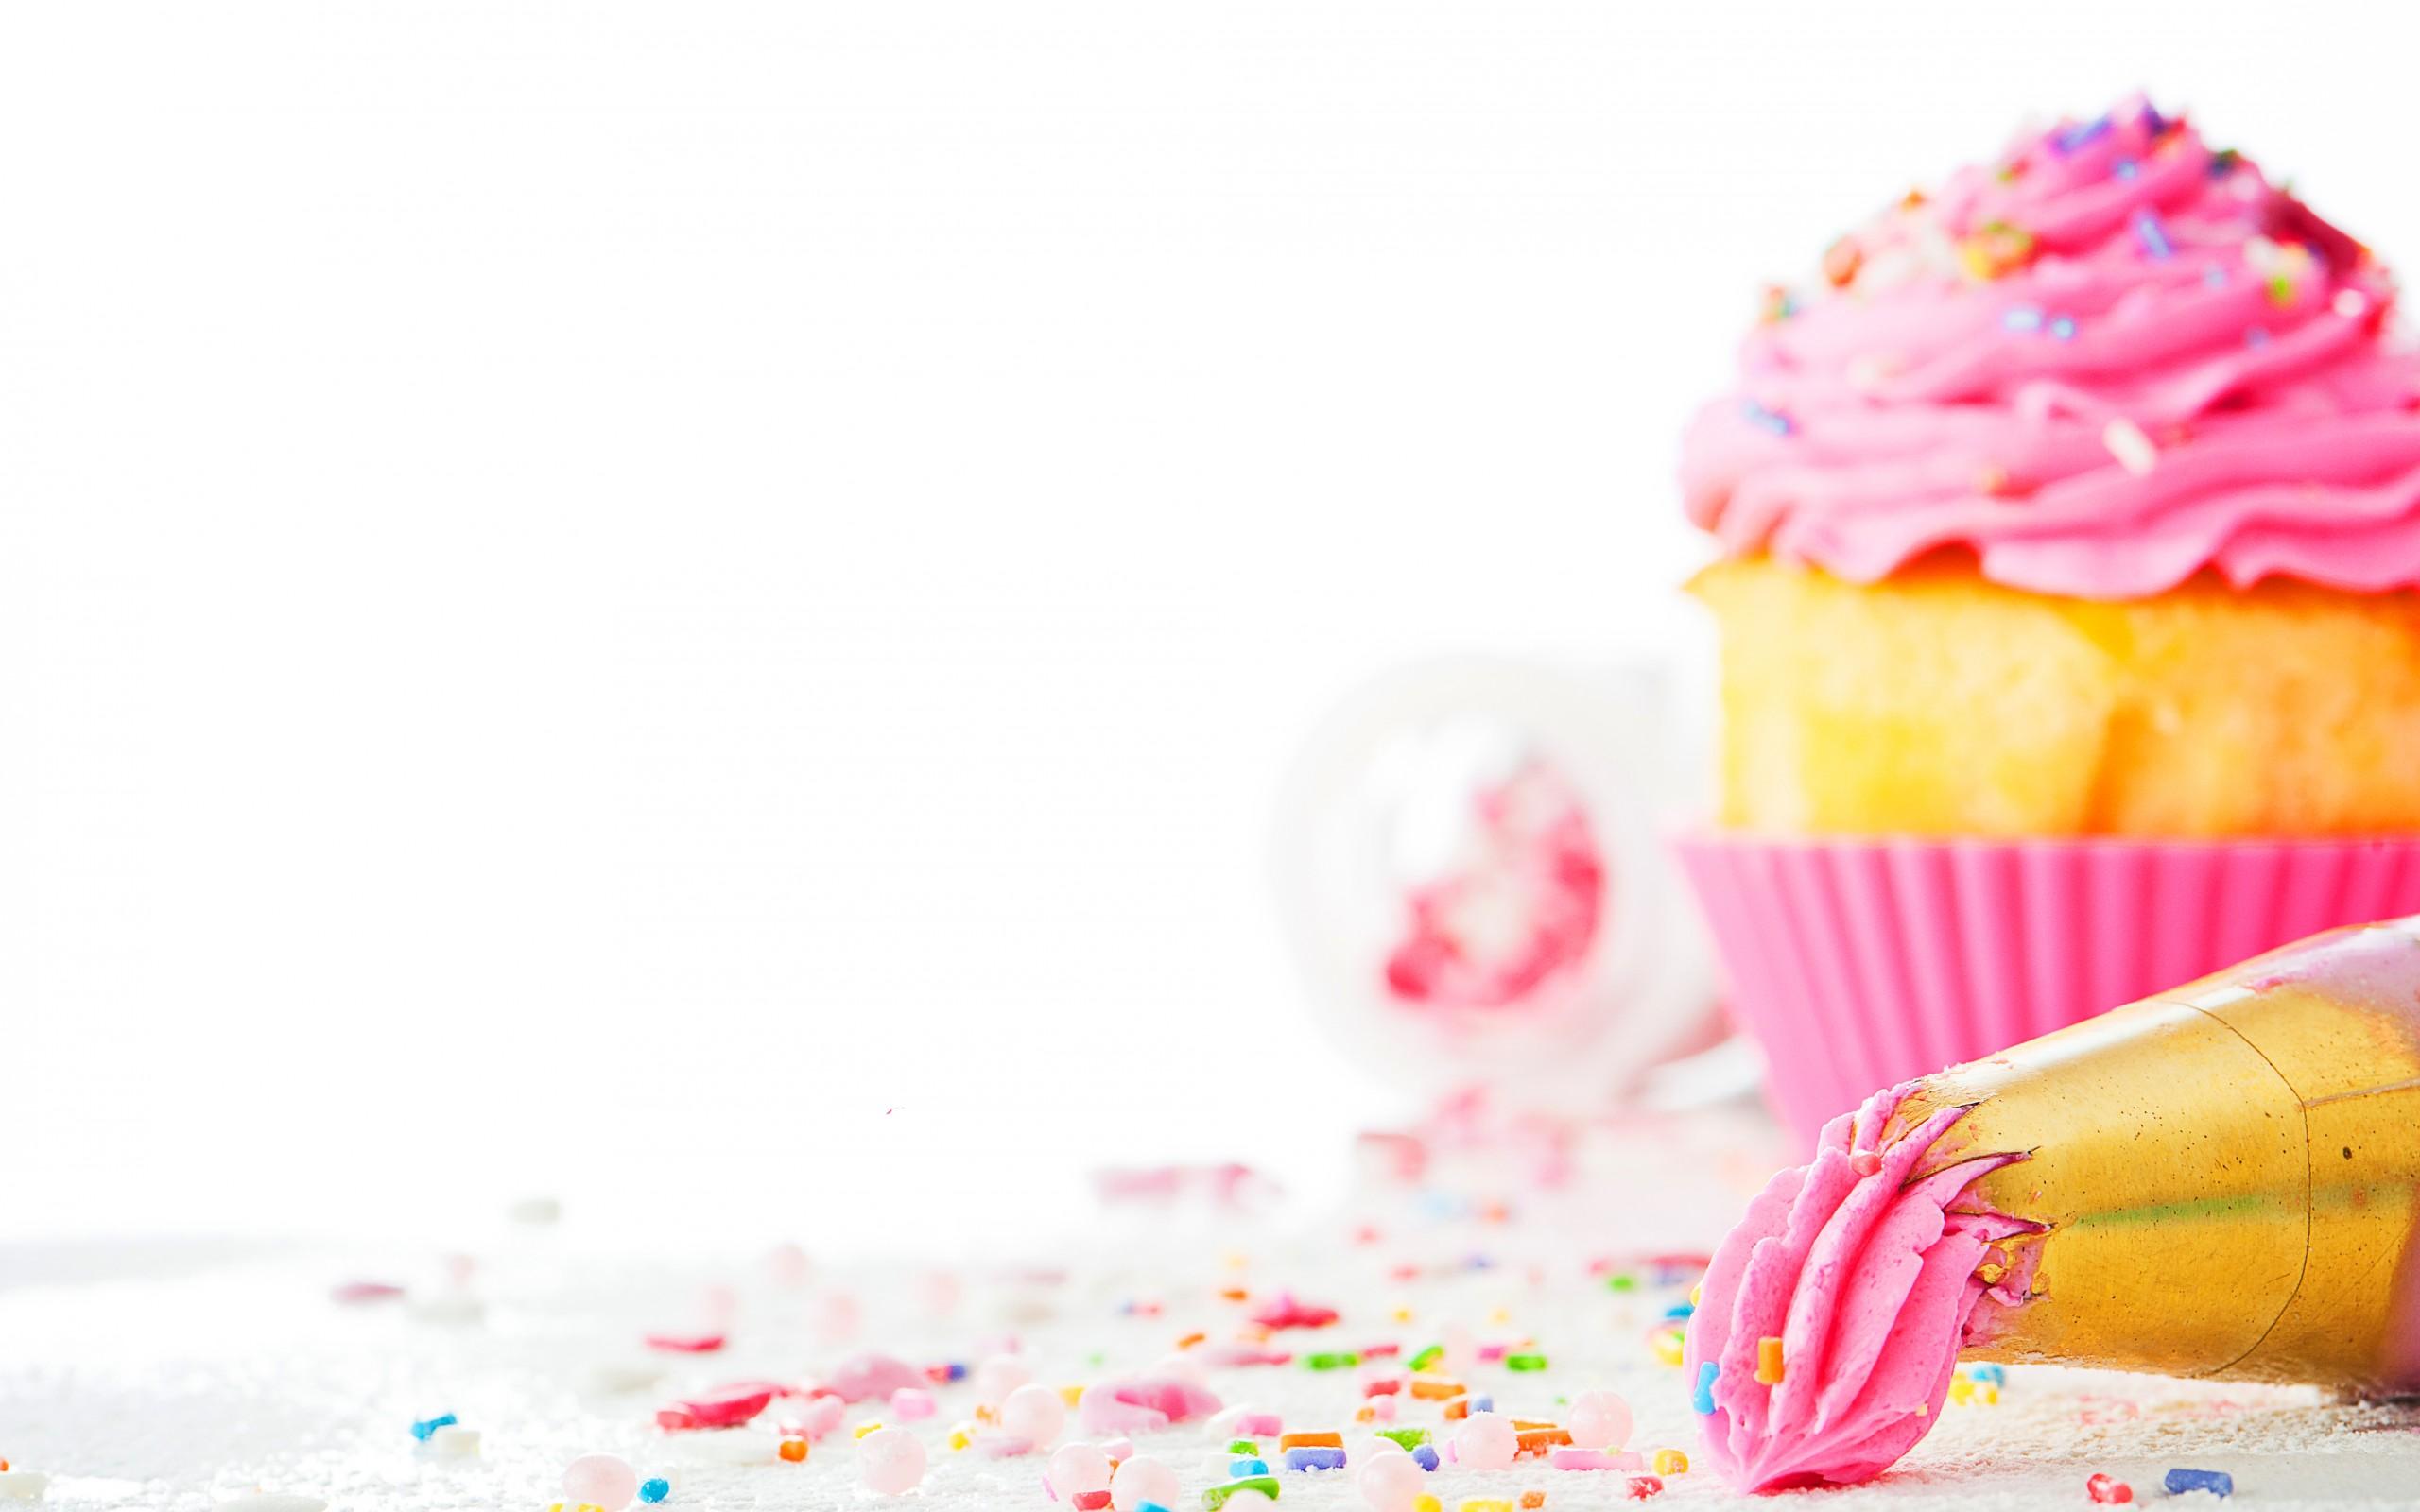 Cupcake Computer Wallpapers Desktop Backgrounds 2560x1600 ID 2560x1600